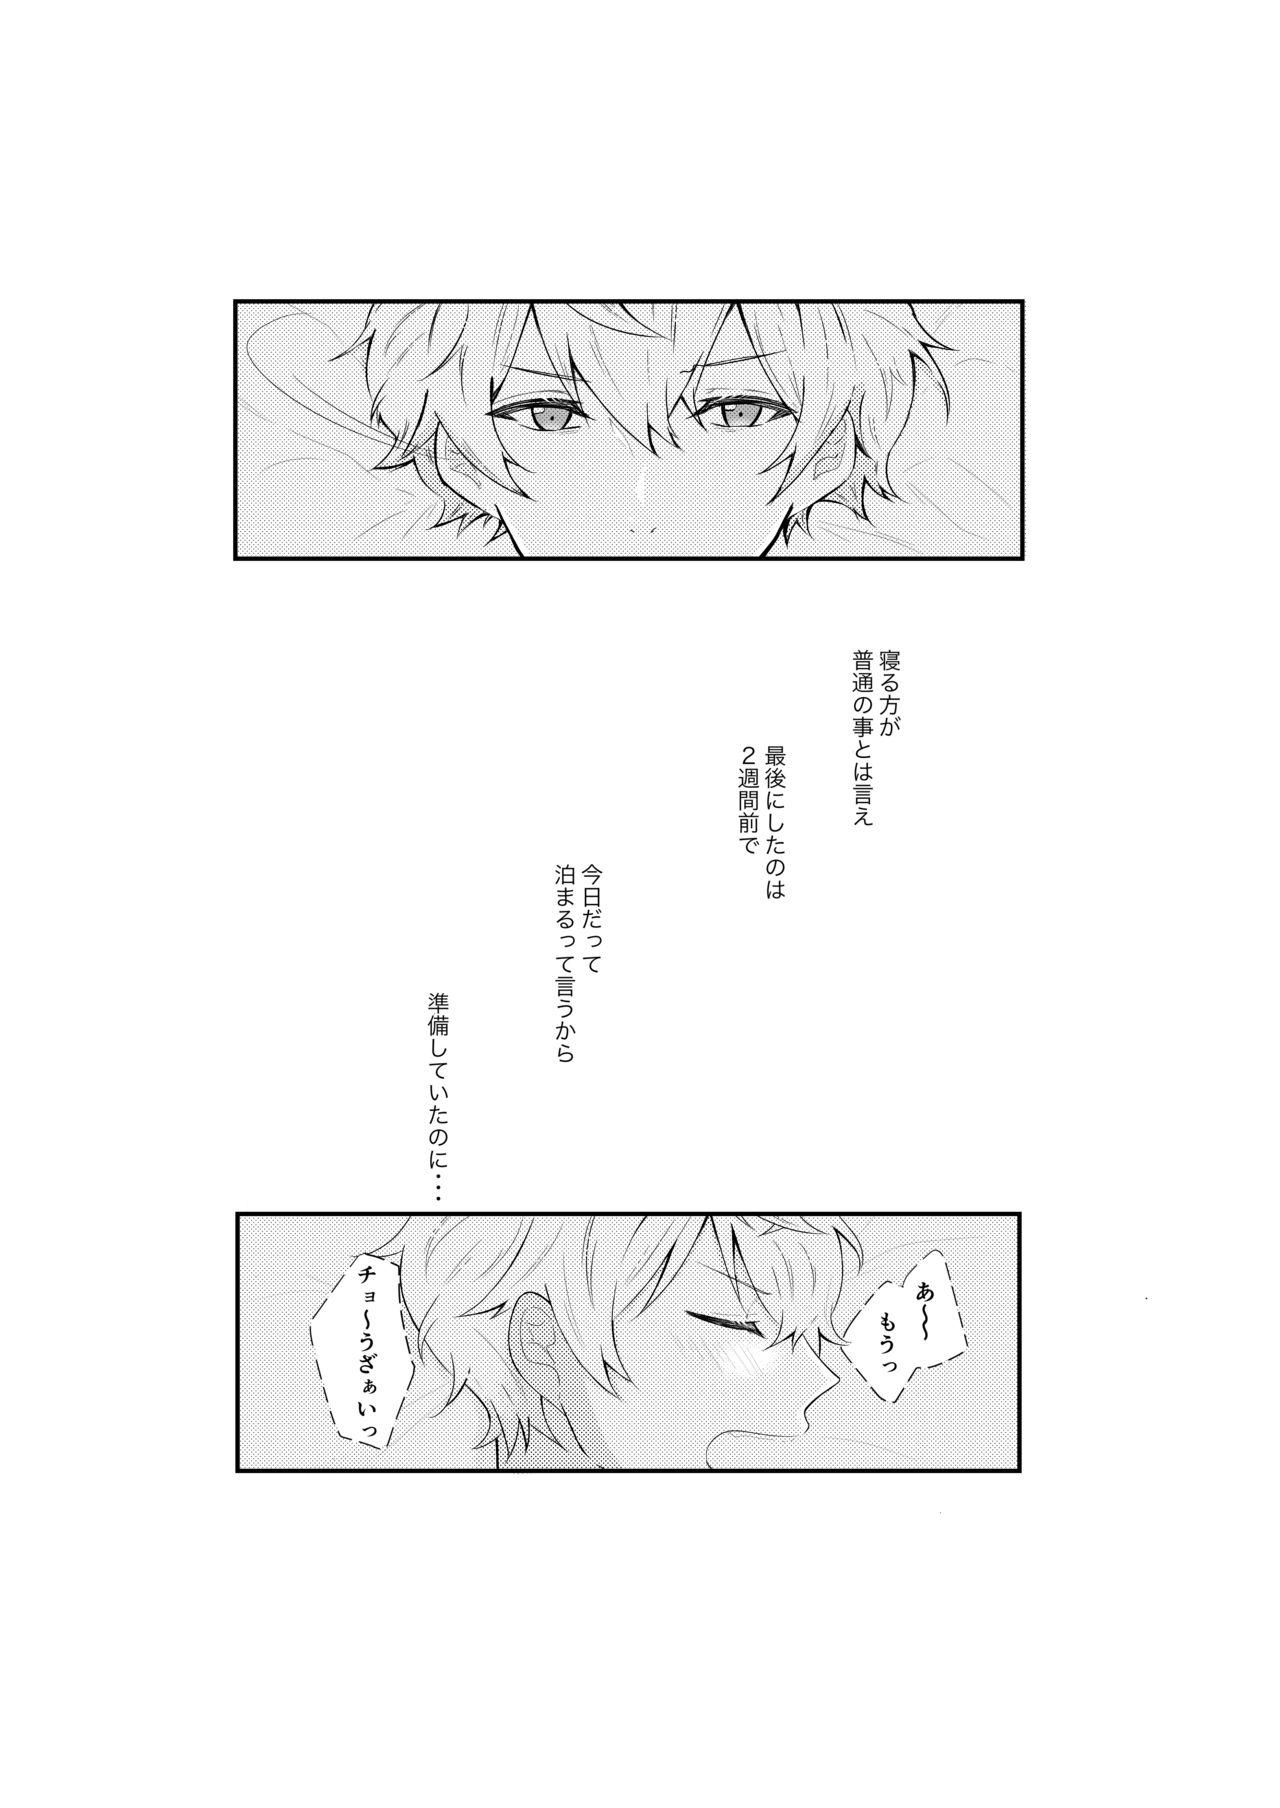 Midnight dream 4